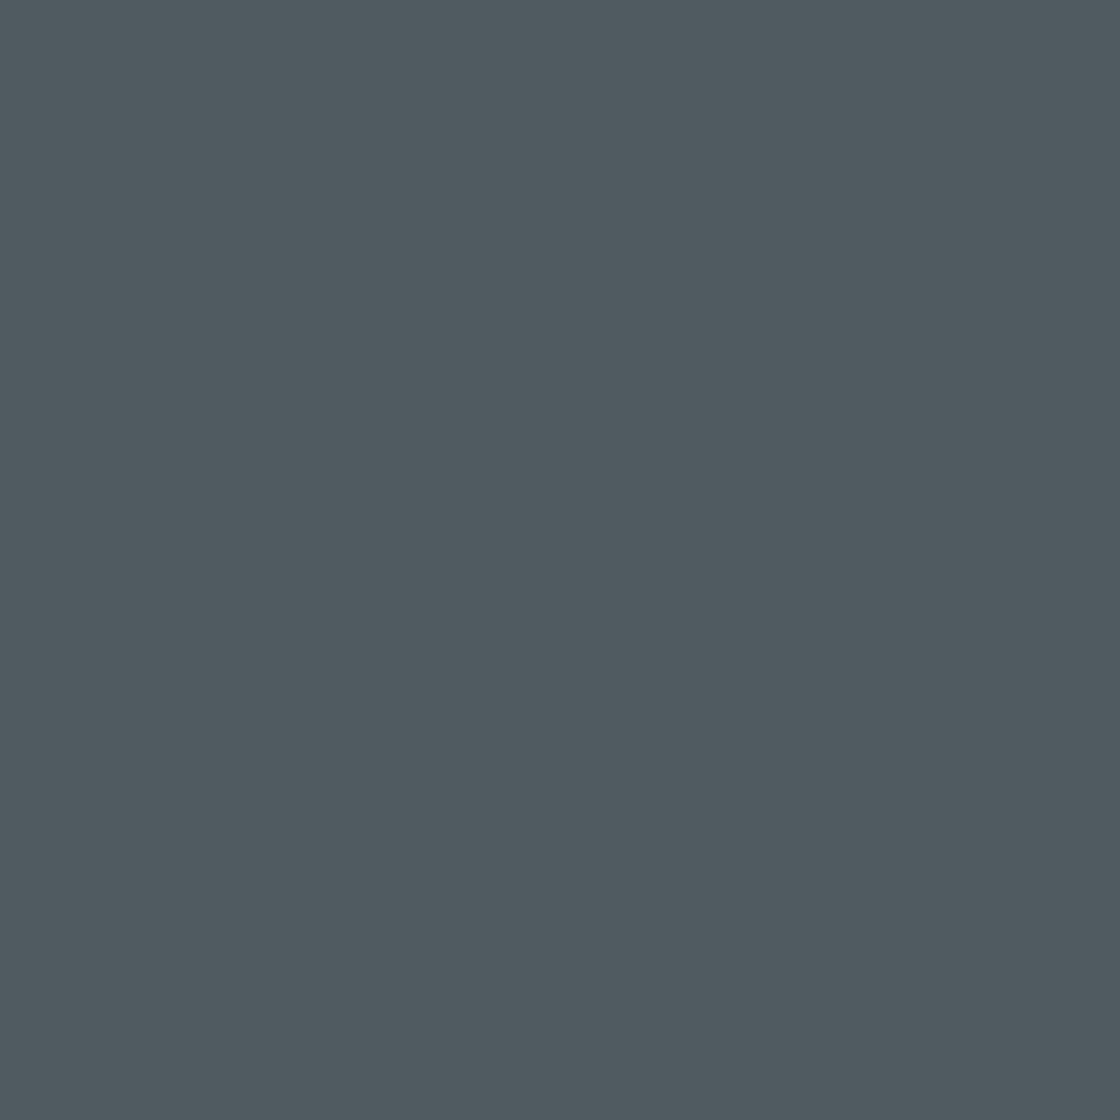 Stahl Bodenplatte Schwarz Kreisabschnitt 1100x950 mm Funkenschutz Platte Kamin